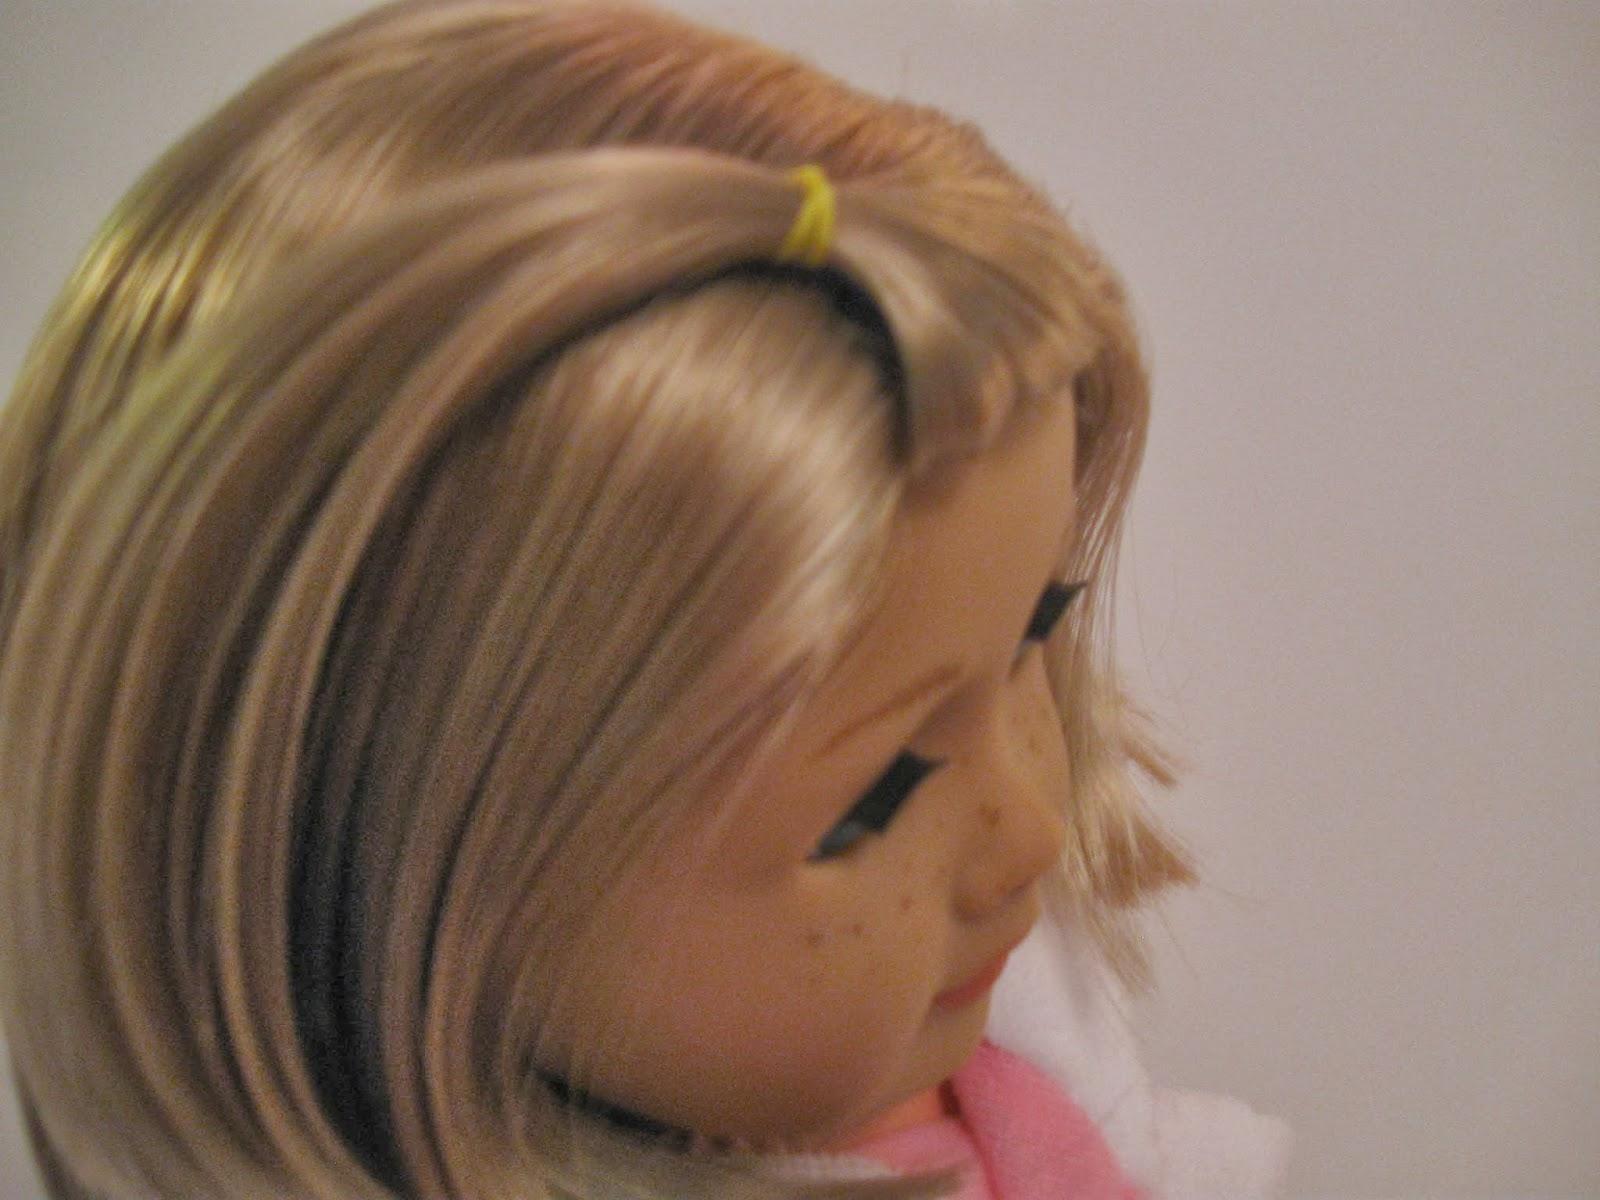 Hairstyles For Short Hair Quick: Seastar Studios: Hairstyles For Dolls With Short Hair